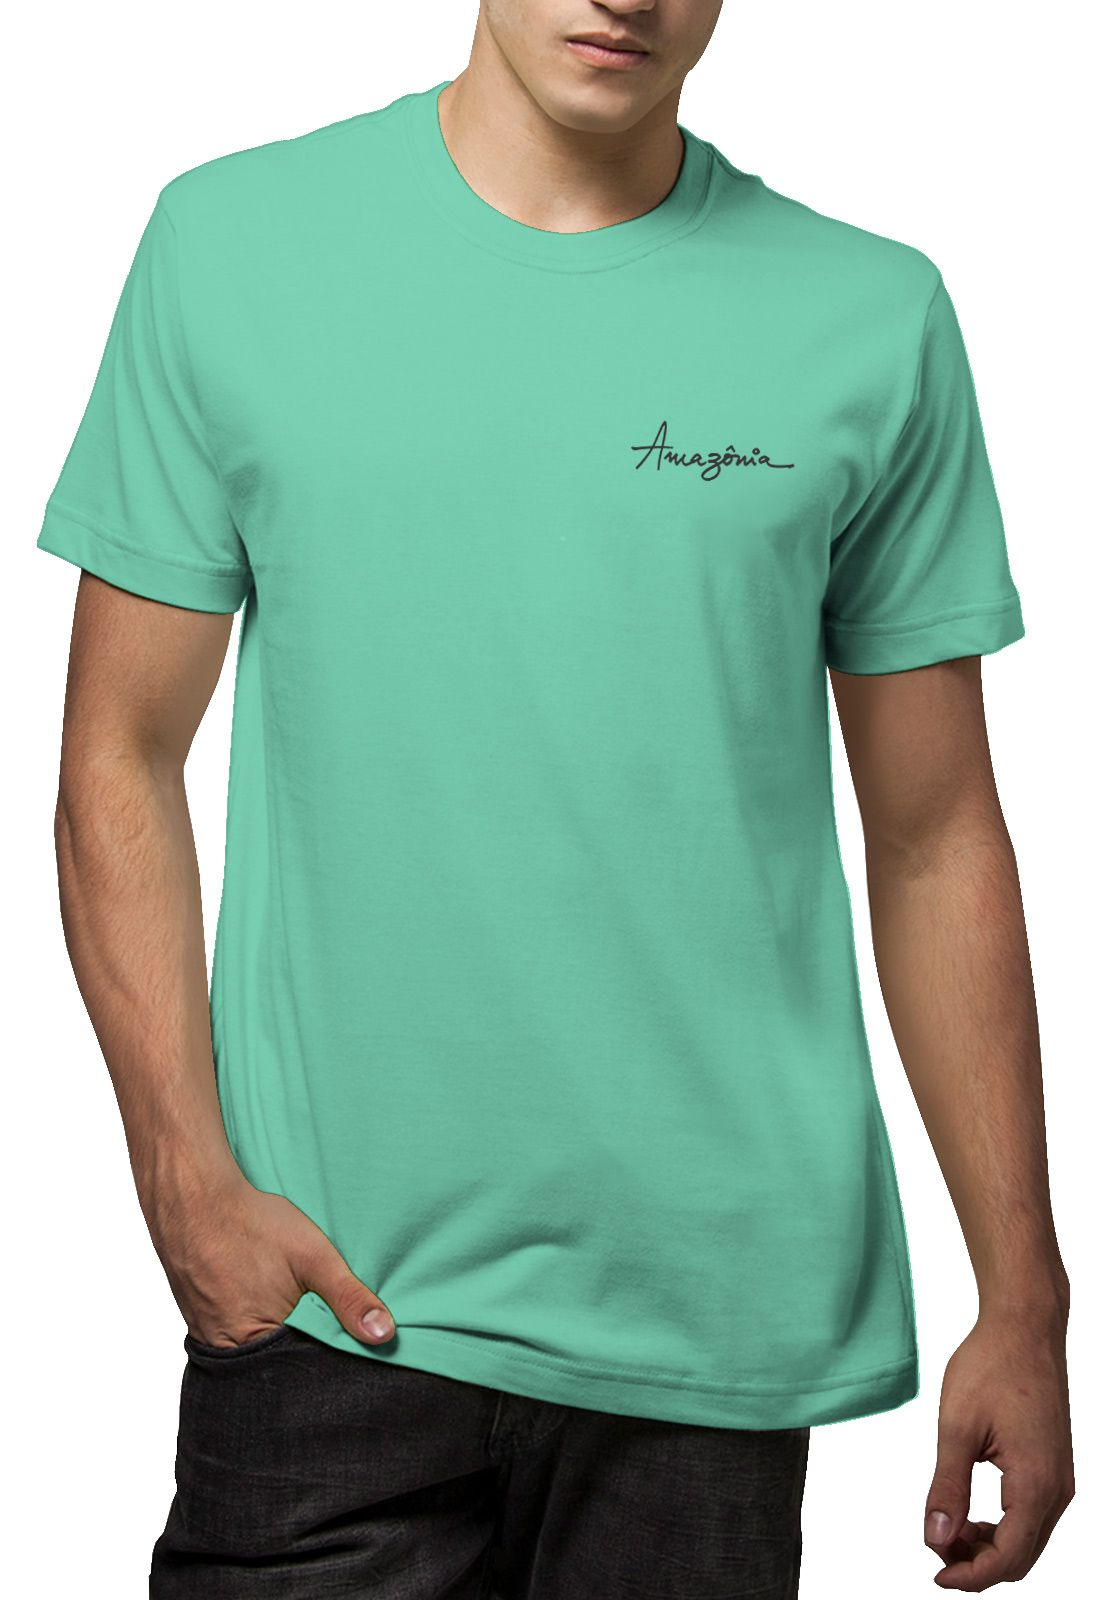 Camiseta Amazônia Semeando a Natureza - Verde Claro